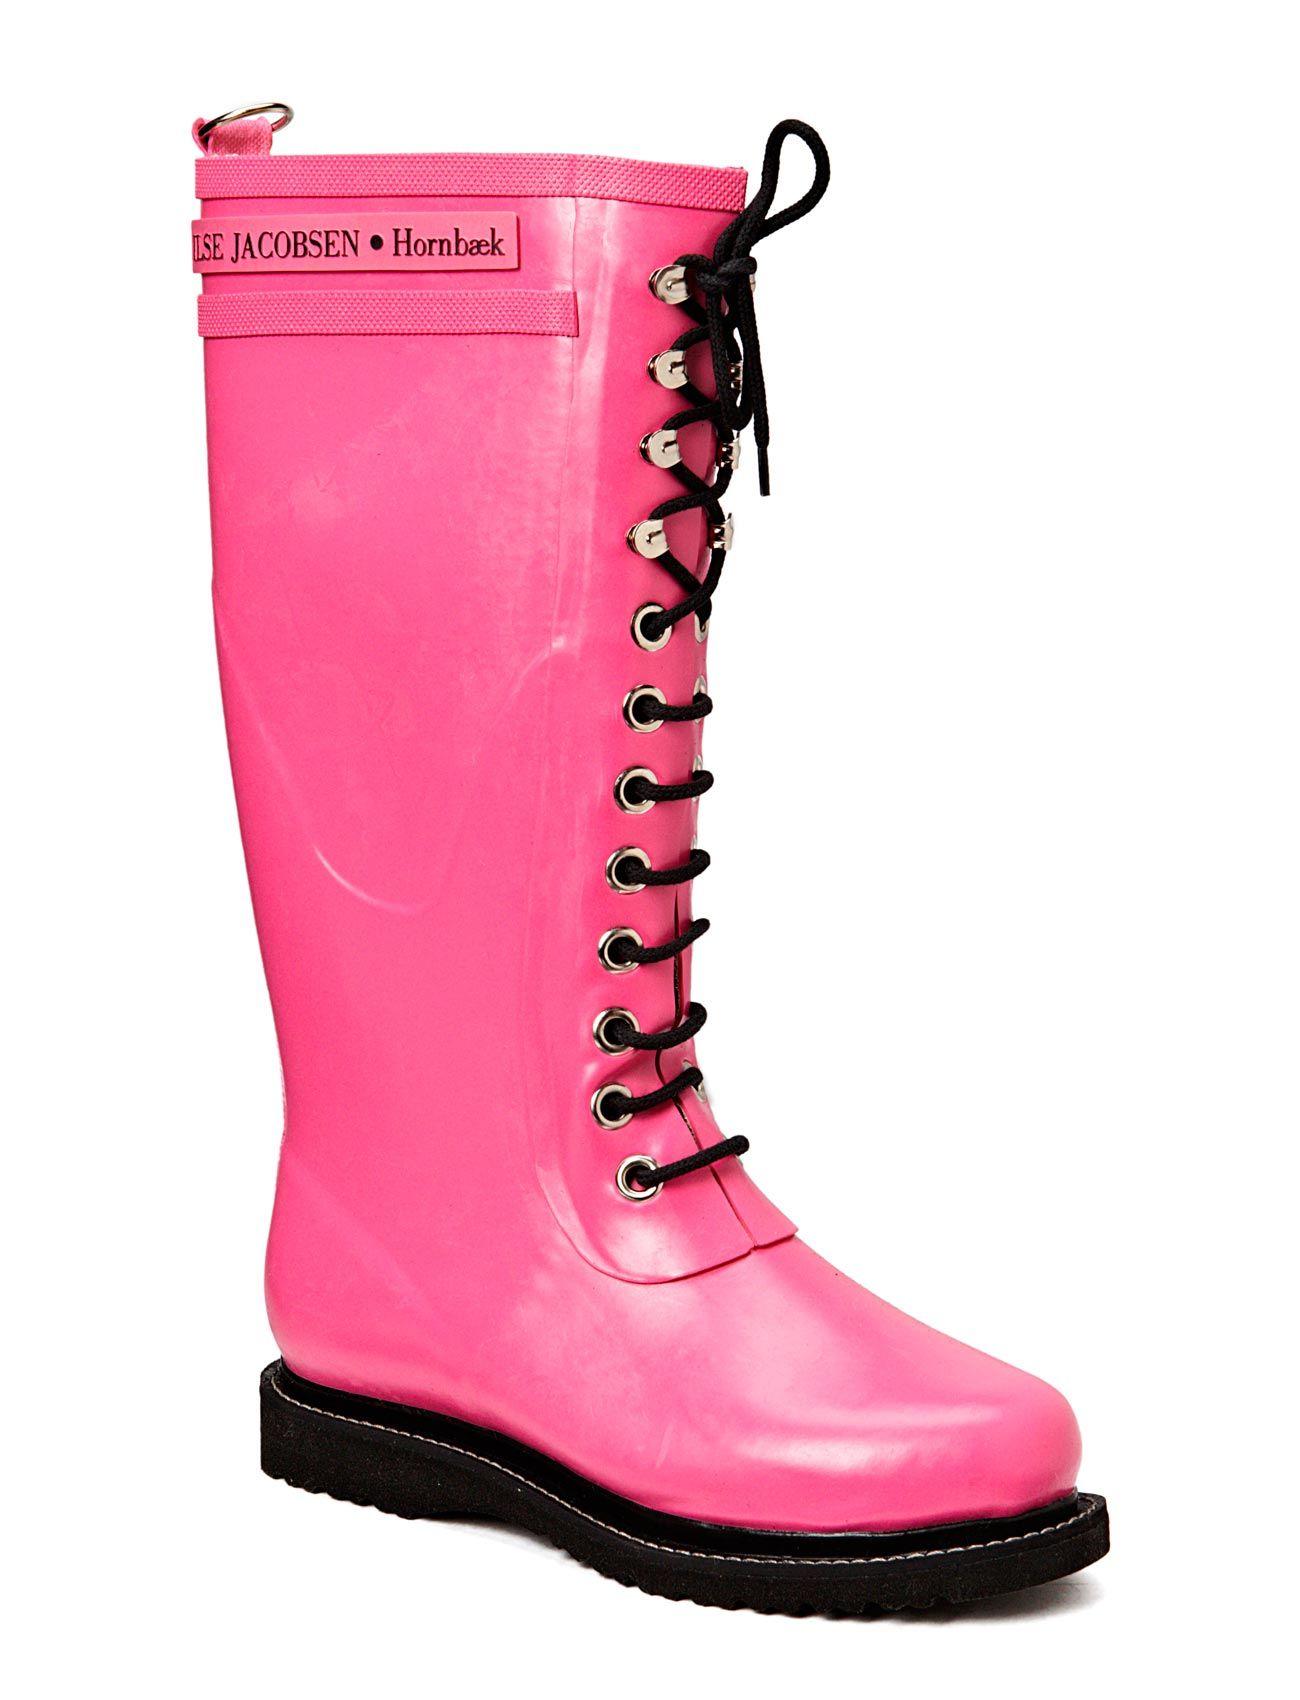 1de16a9fbfa1 Enorma priser på Rain Boot - Long, Classic With Laces Ilse Jacobsen Stövlar  till Kvinnor